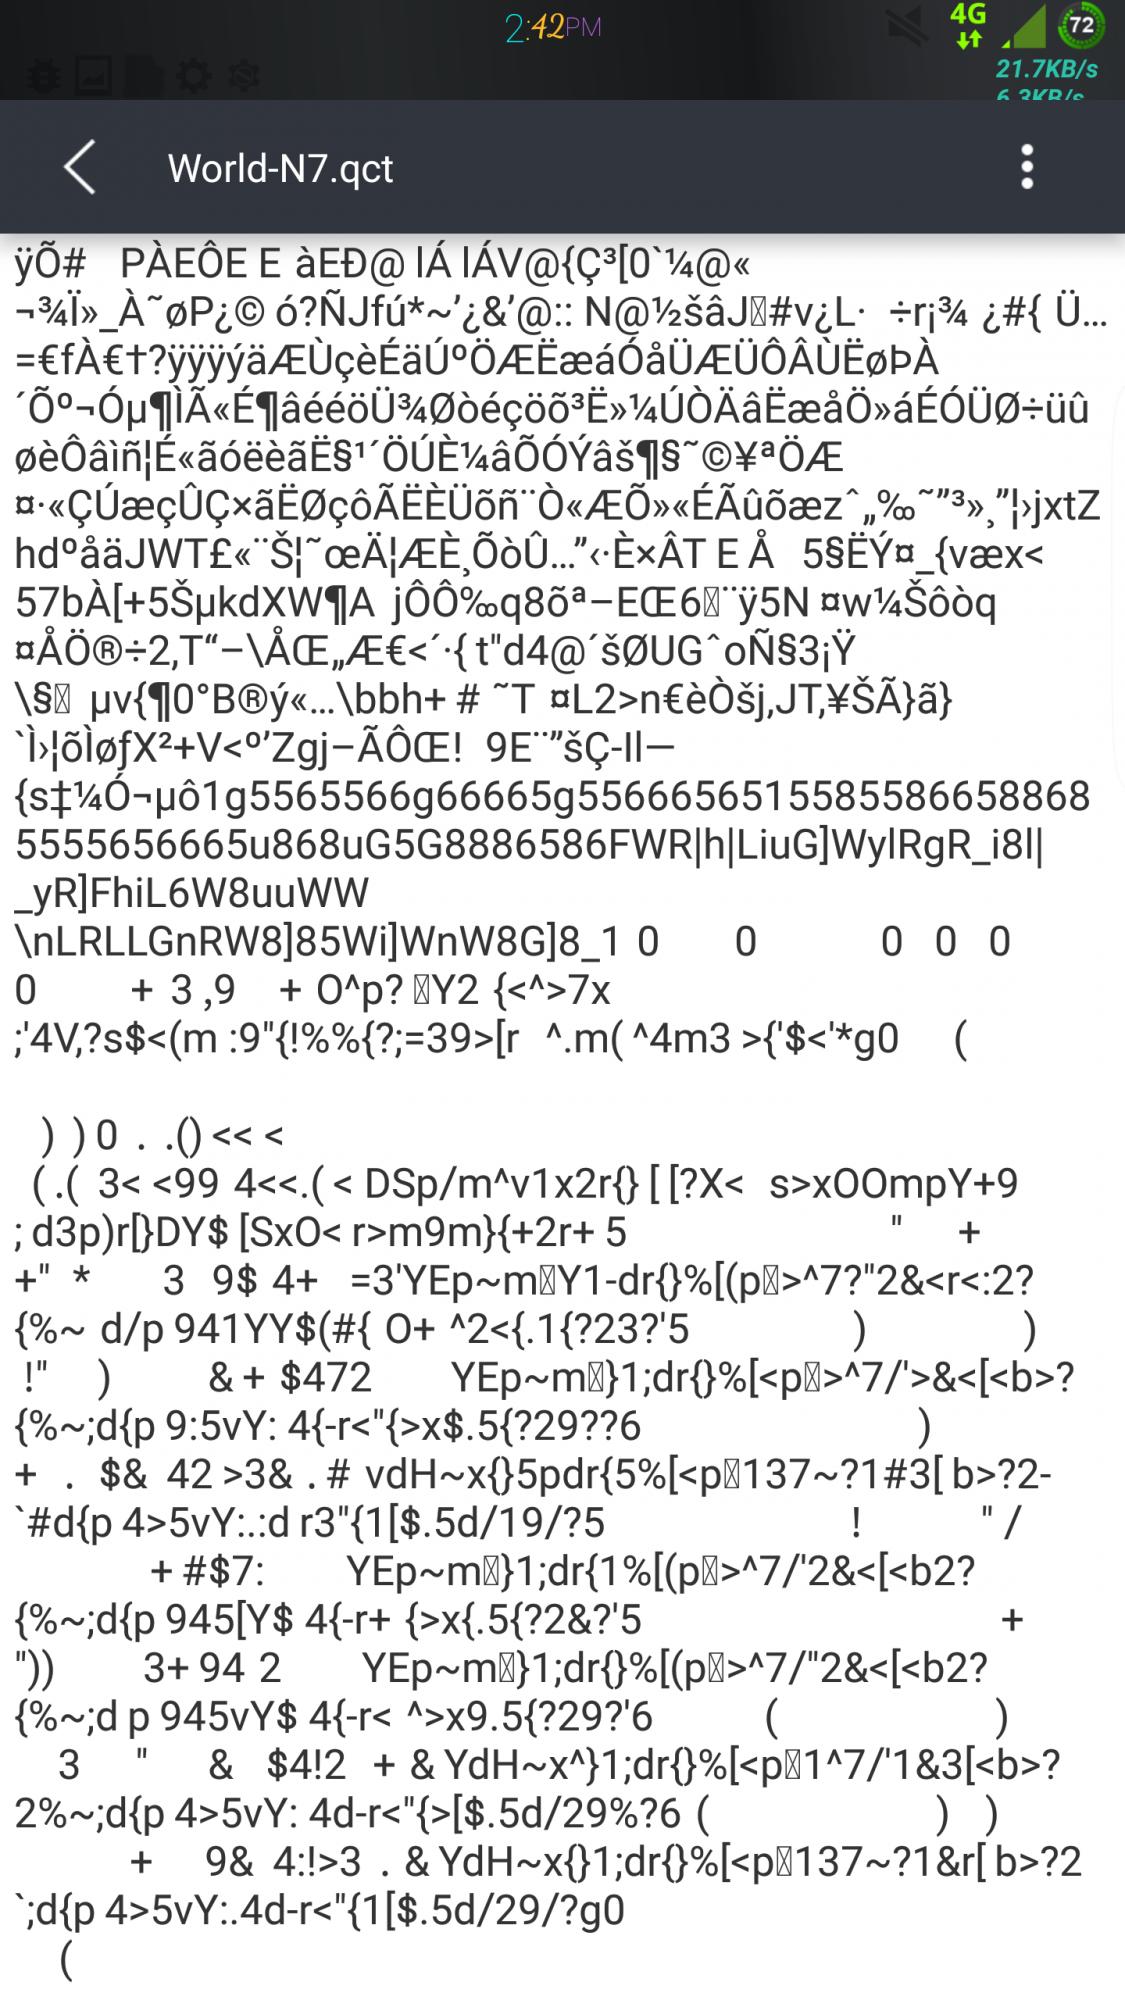 Screenshot_2021-02-23-14-42-04.png